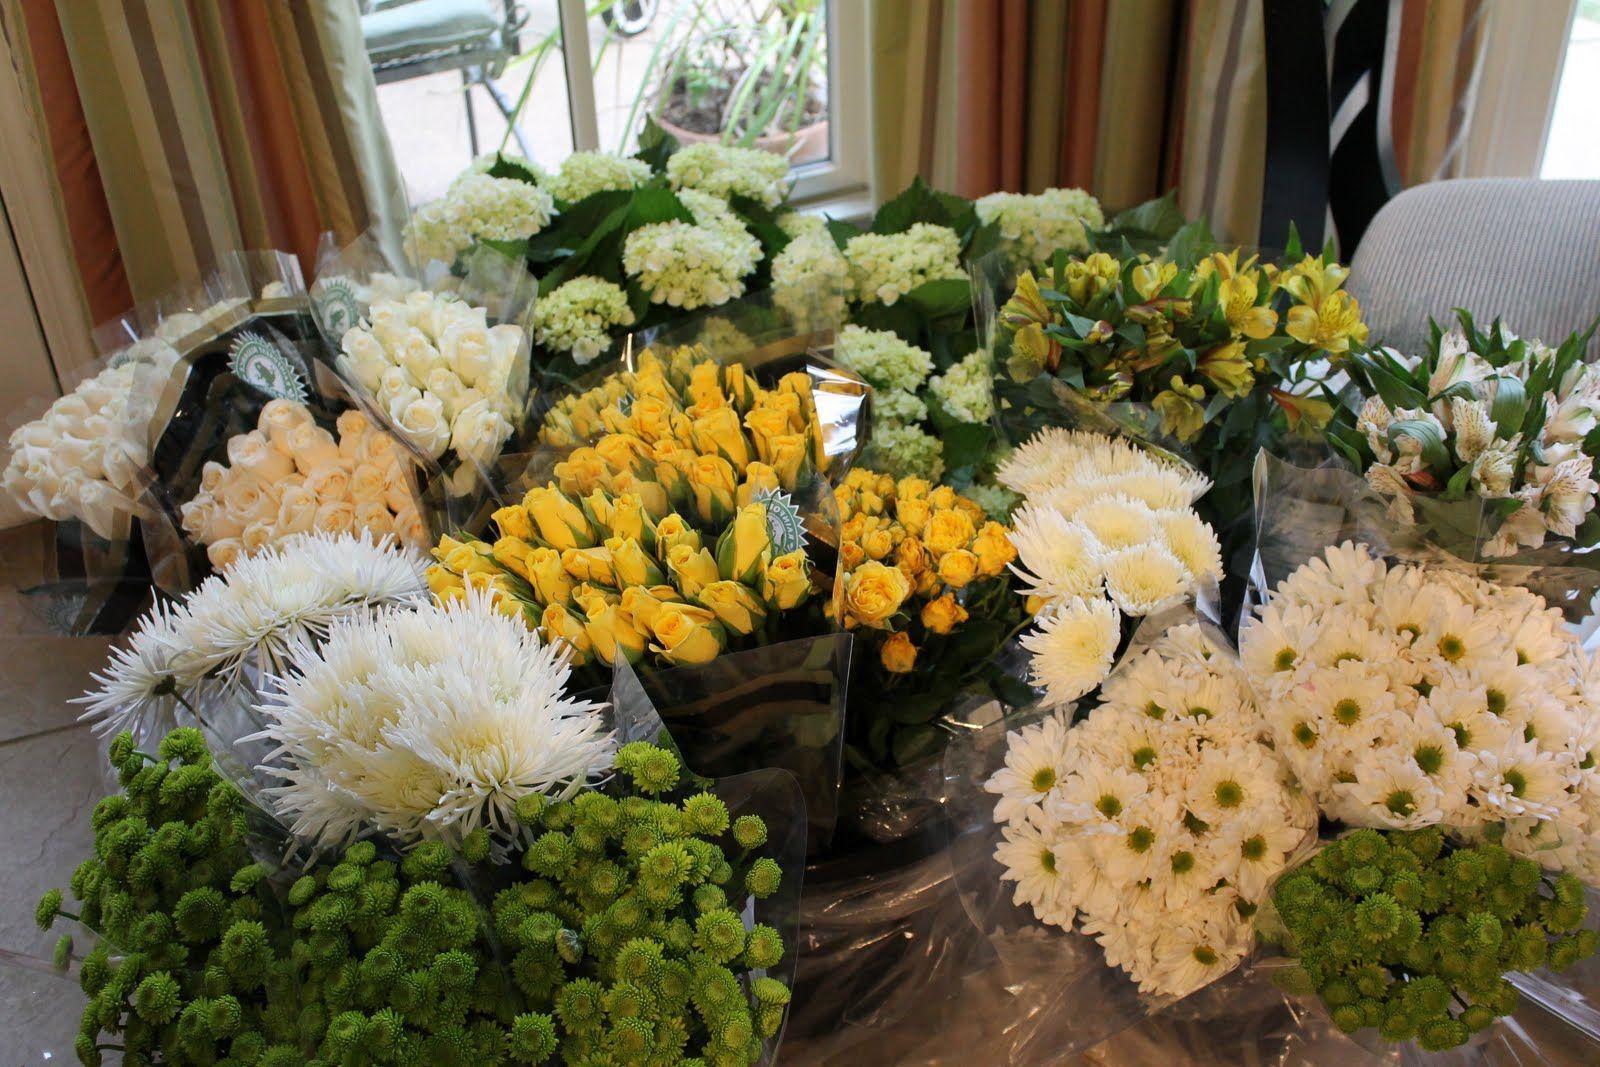 costco wedding flowers costco flowers. Black Bedroom Furniture Sets. Home Design Ideas